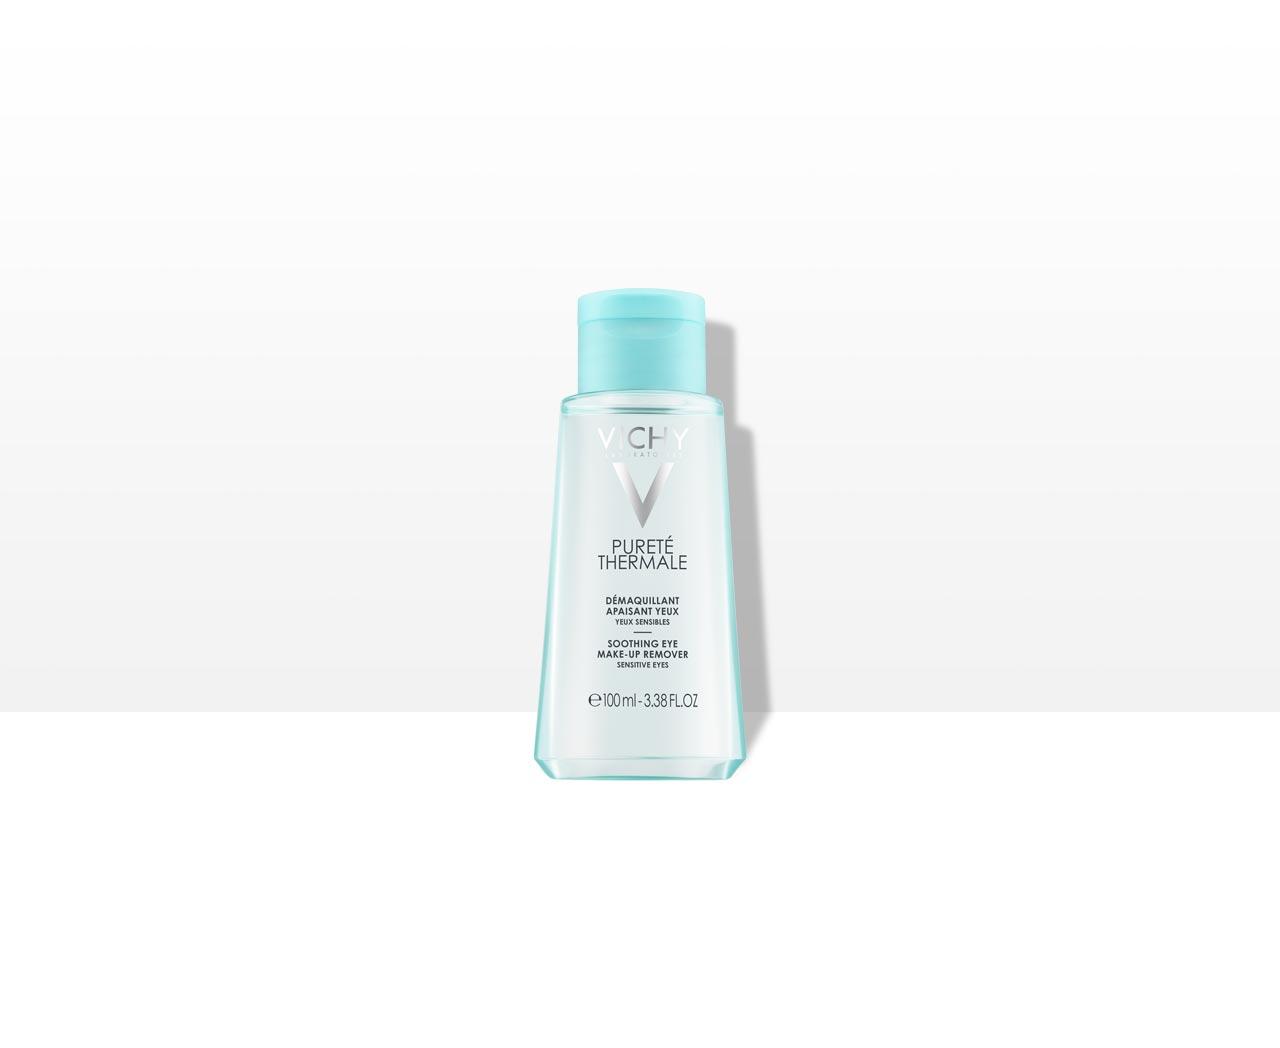 Purete Thermale - Démaquillant Apaisant Yeux - Vichy